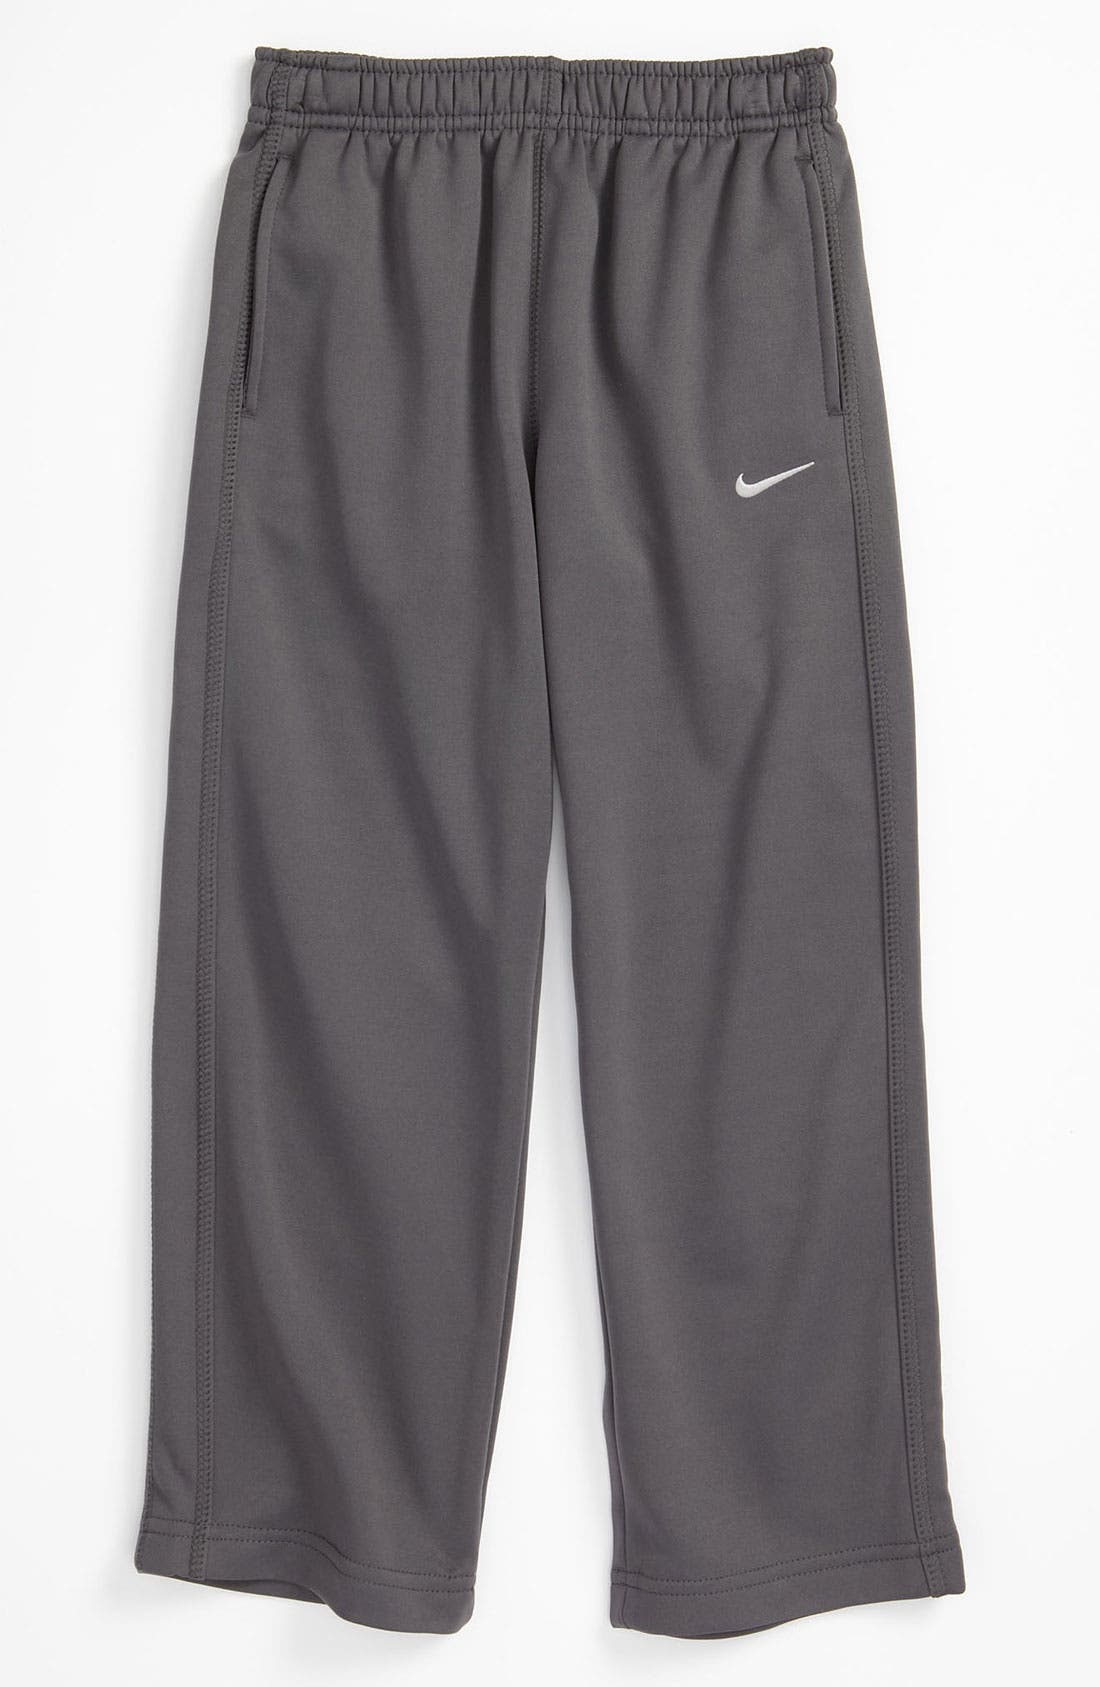 Alternate Image 1 Selected - Nike 'KO' Pants (Little Boys)